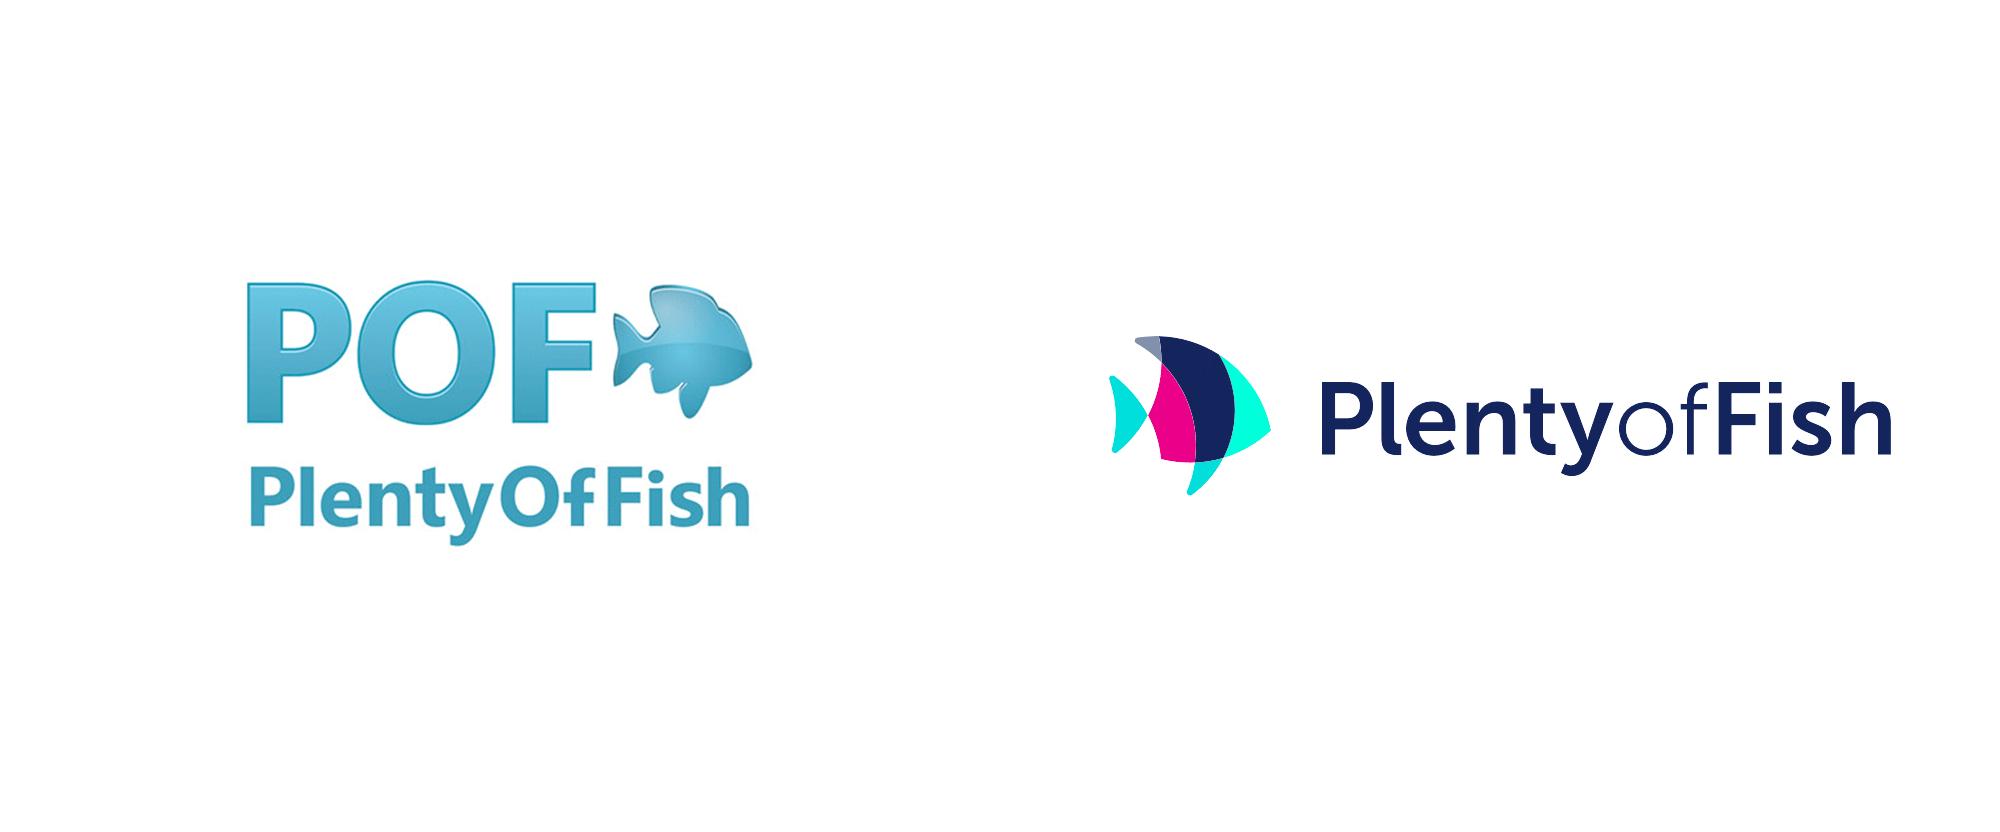 New Logo for Plenty of Fish, Graphic Design Visual Design